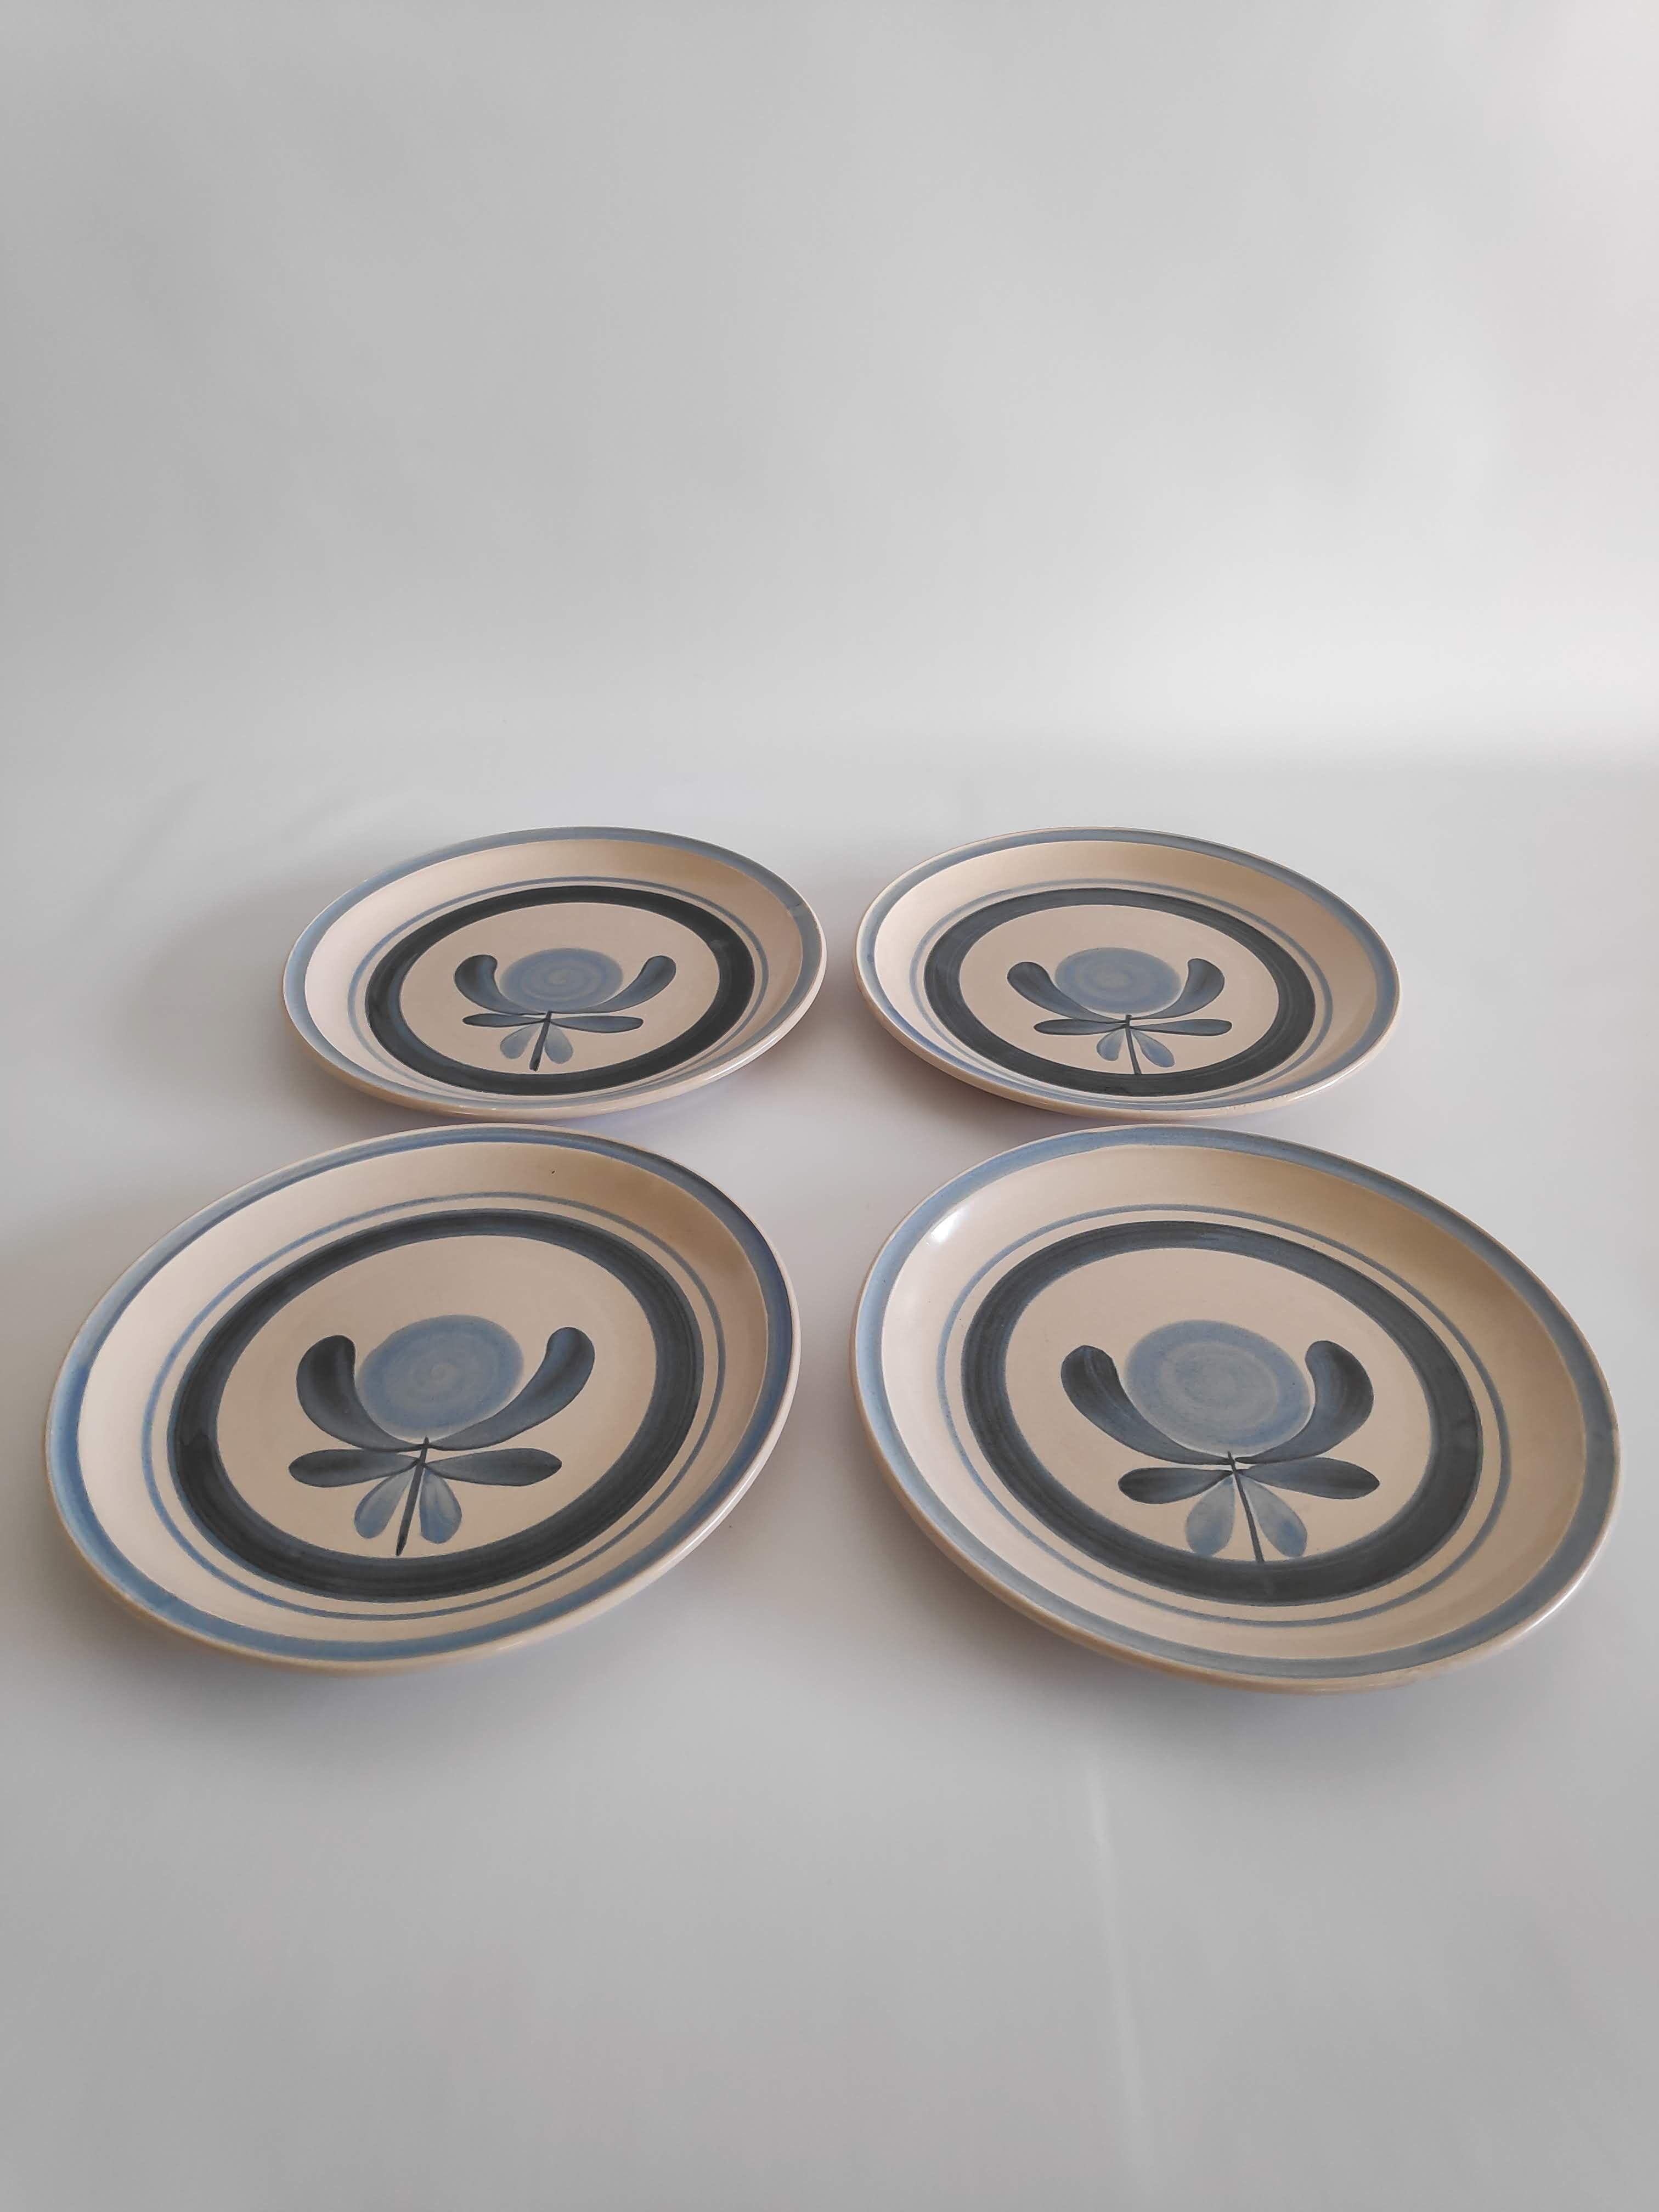 4 Plates Flat Vintage 70s Decor Ancona Gien Selency